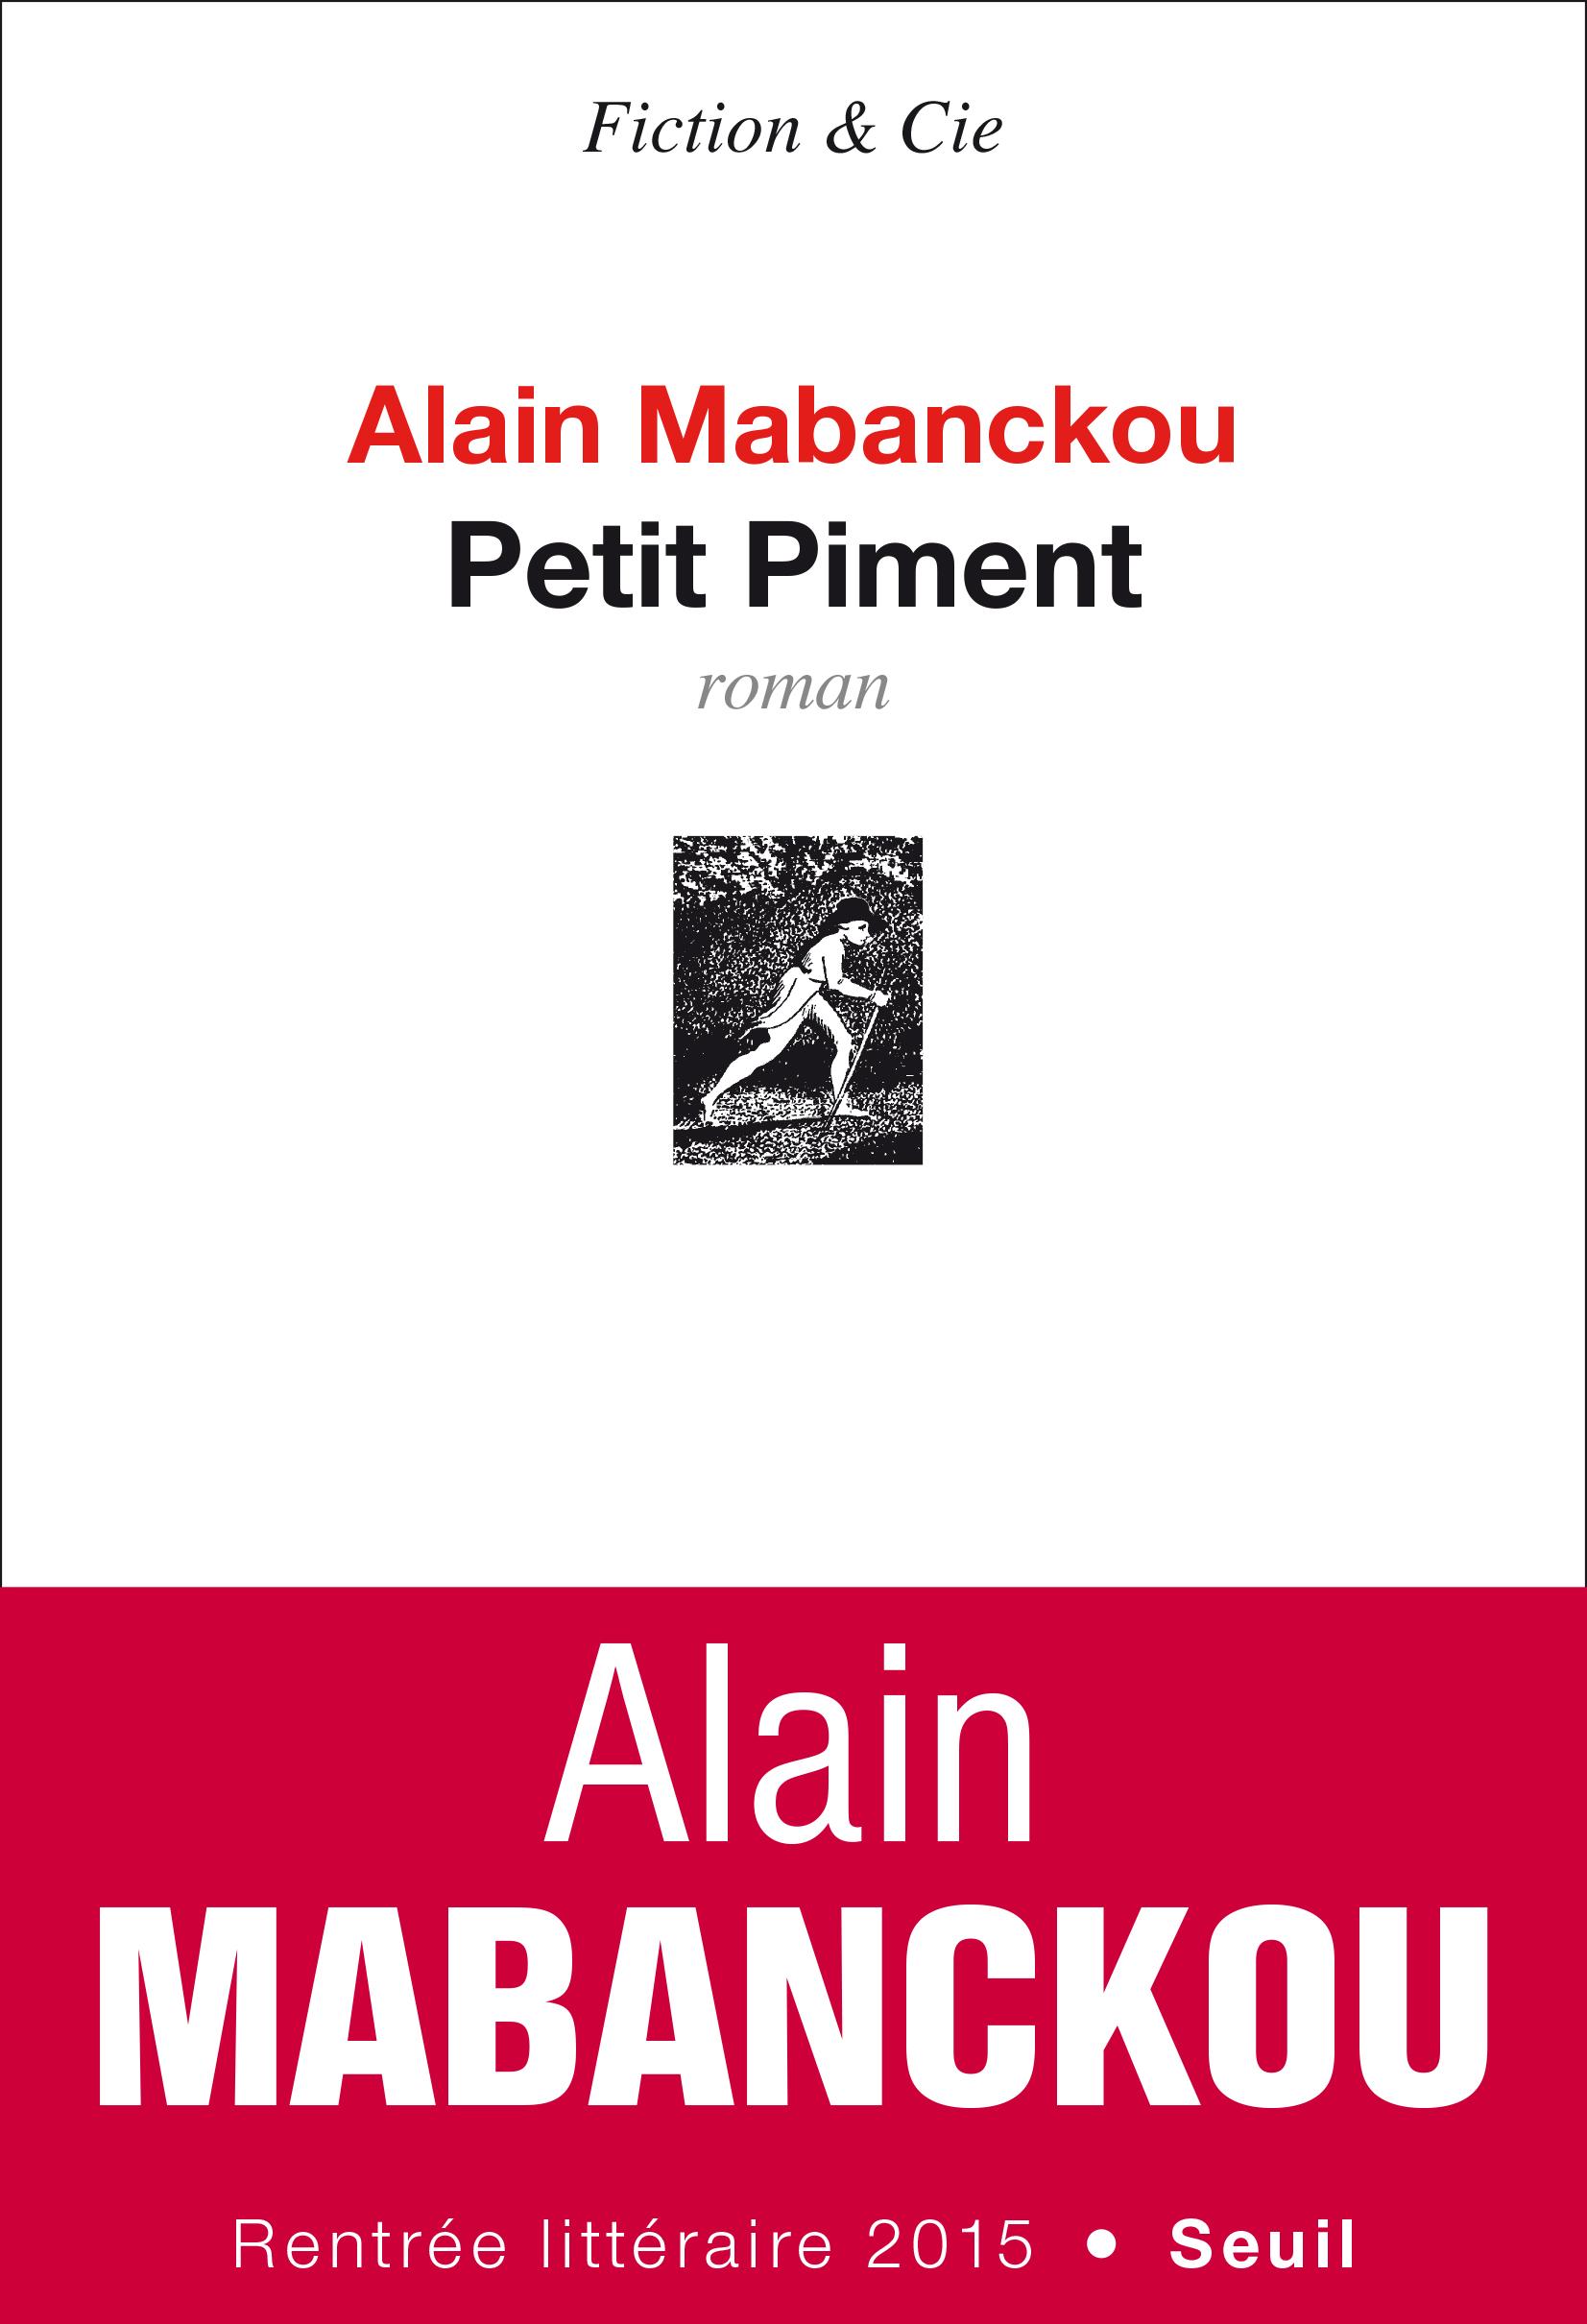 https://i1.wp.com/www.jeuneafrique.com/medias/2015/08/13/Mabanckou-Petit-Piment.jpg